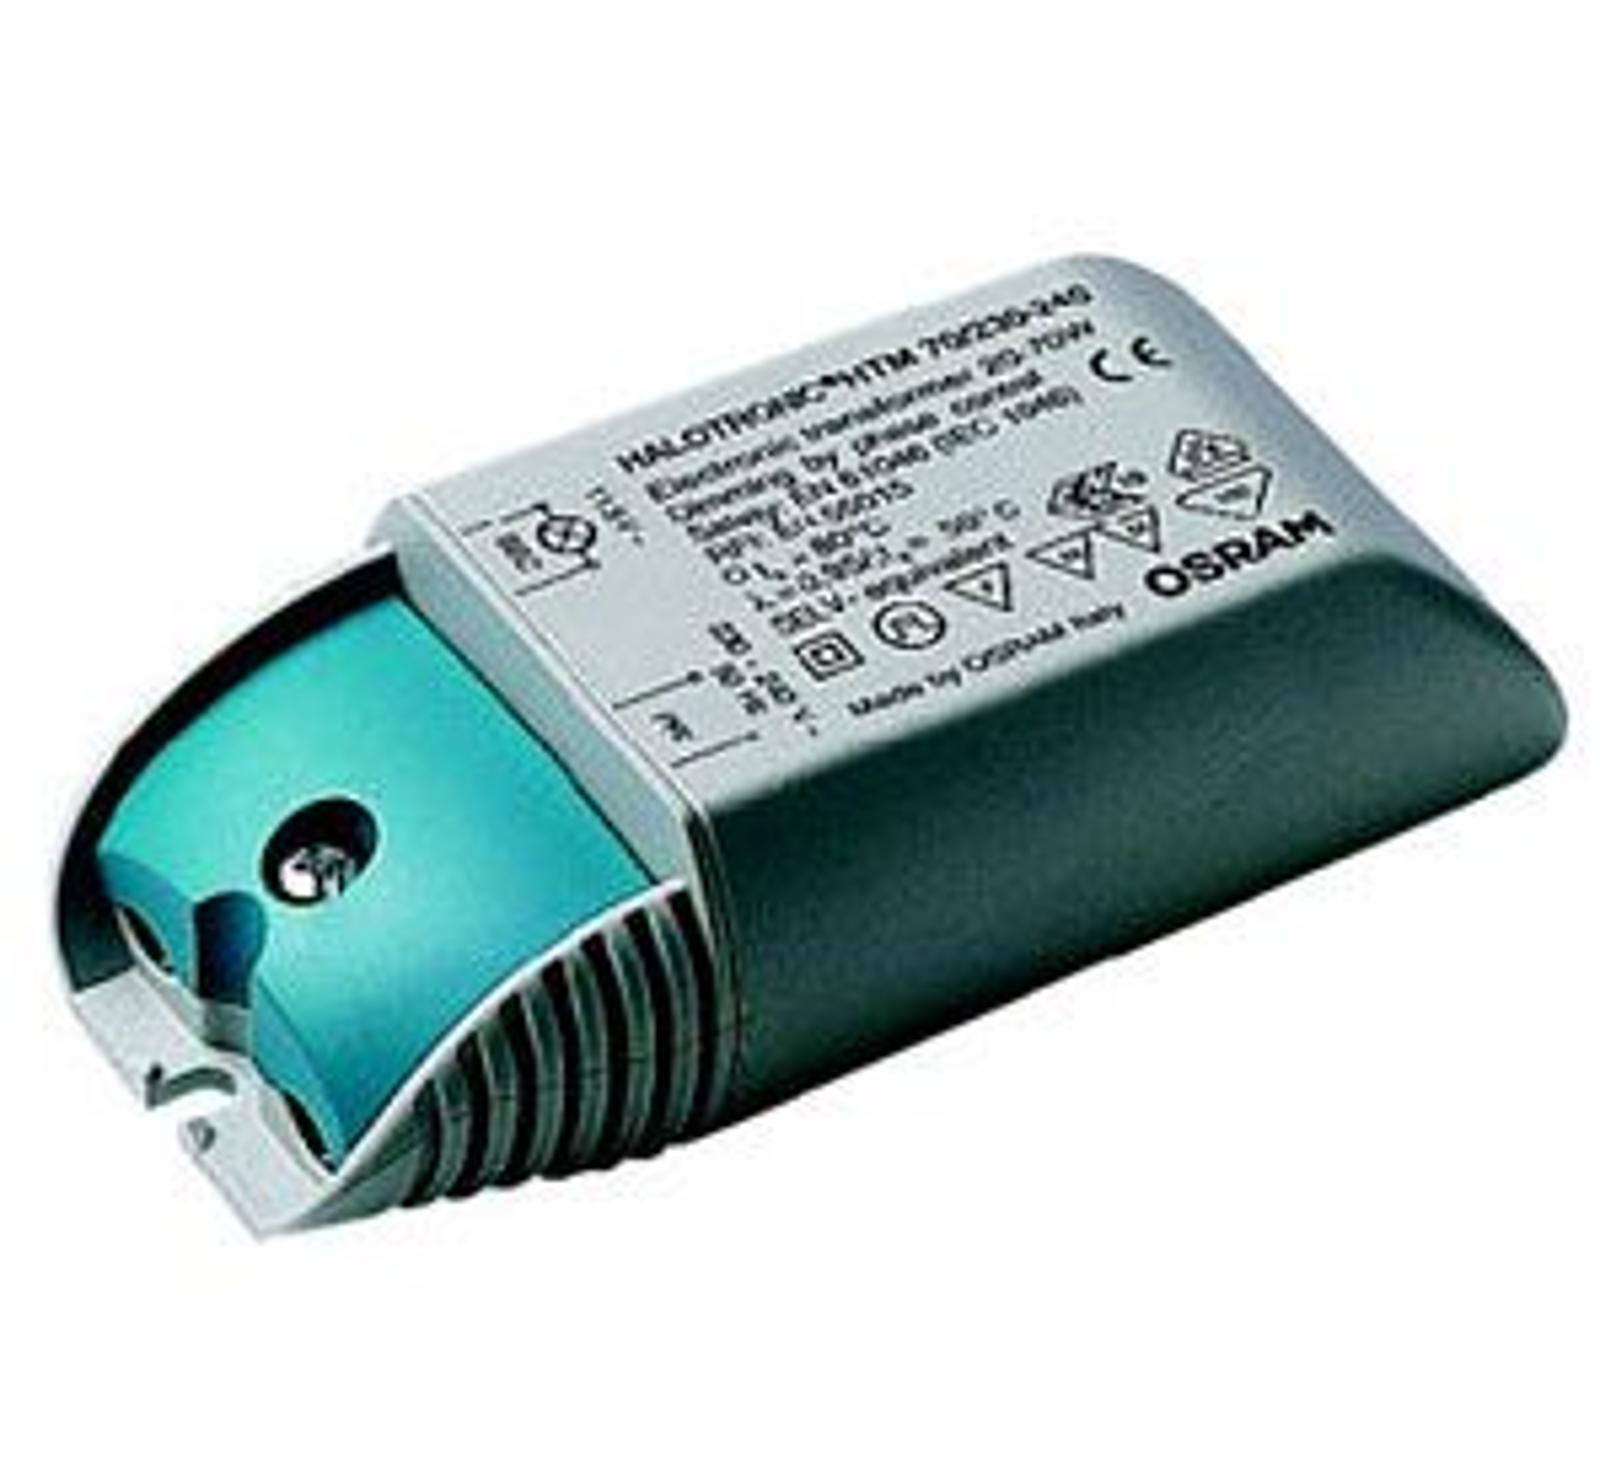 OSRAM 70VA Trafo Halotronic Mouse